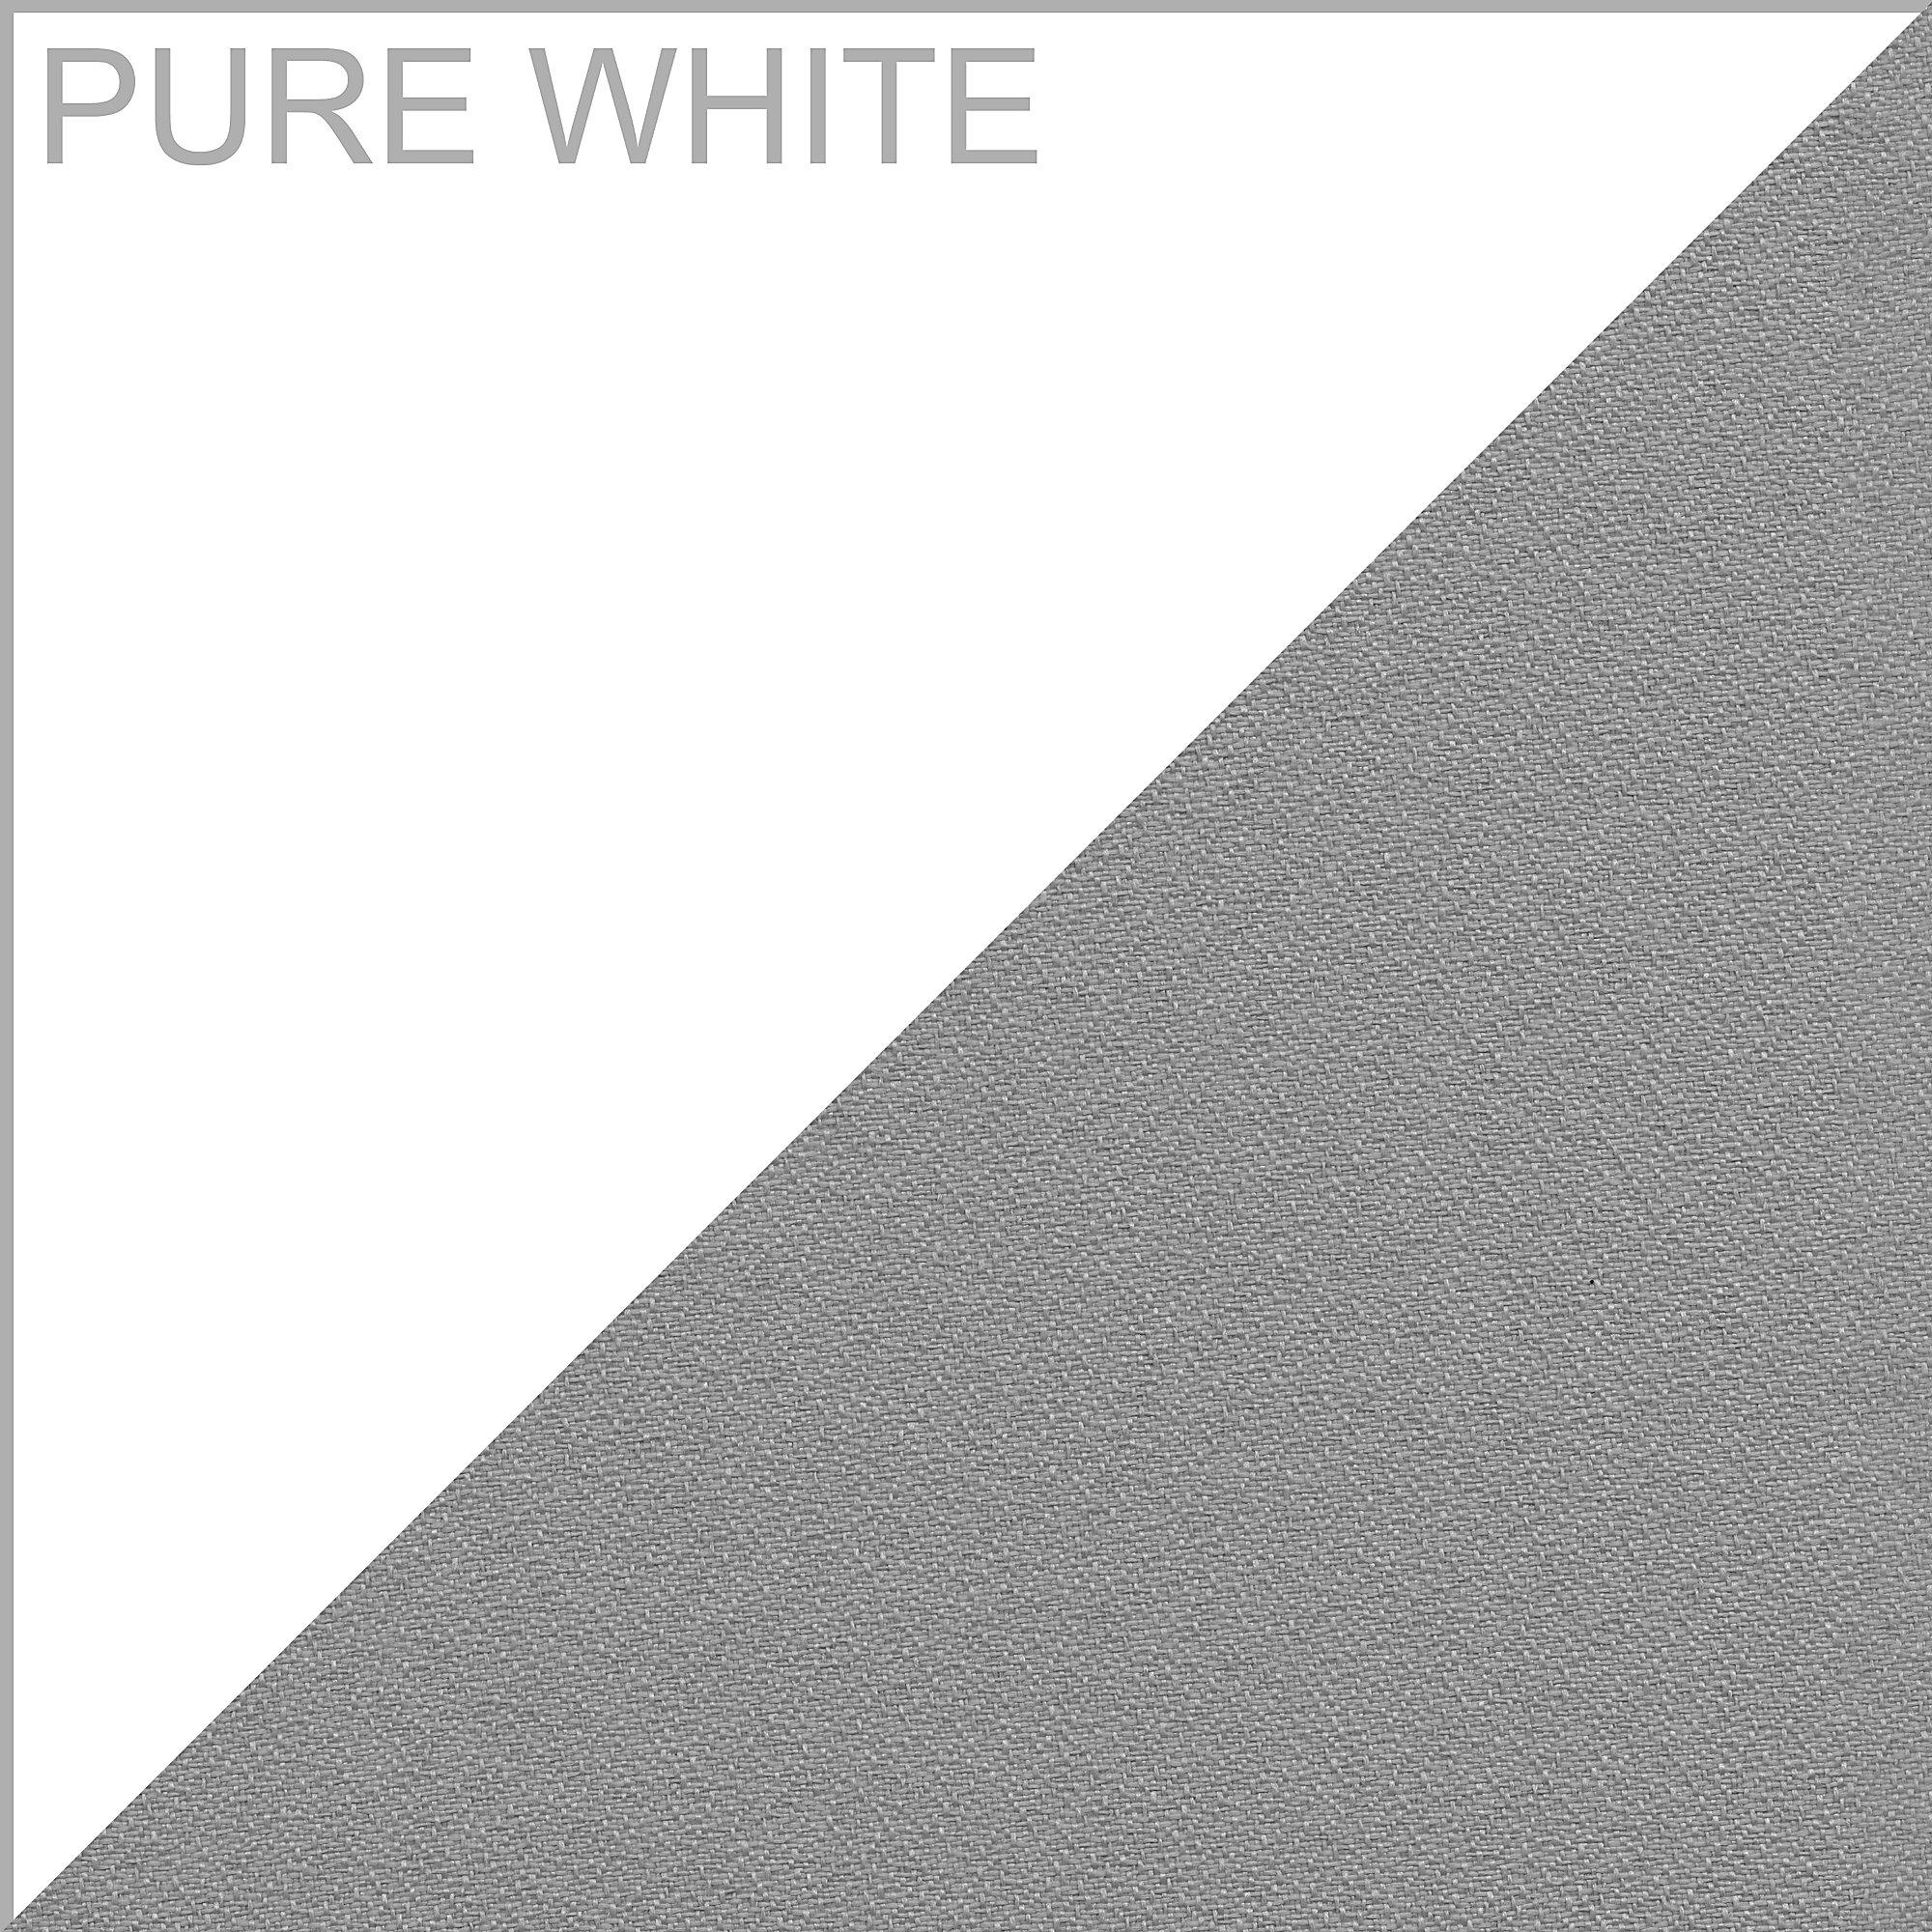 pure white finish